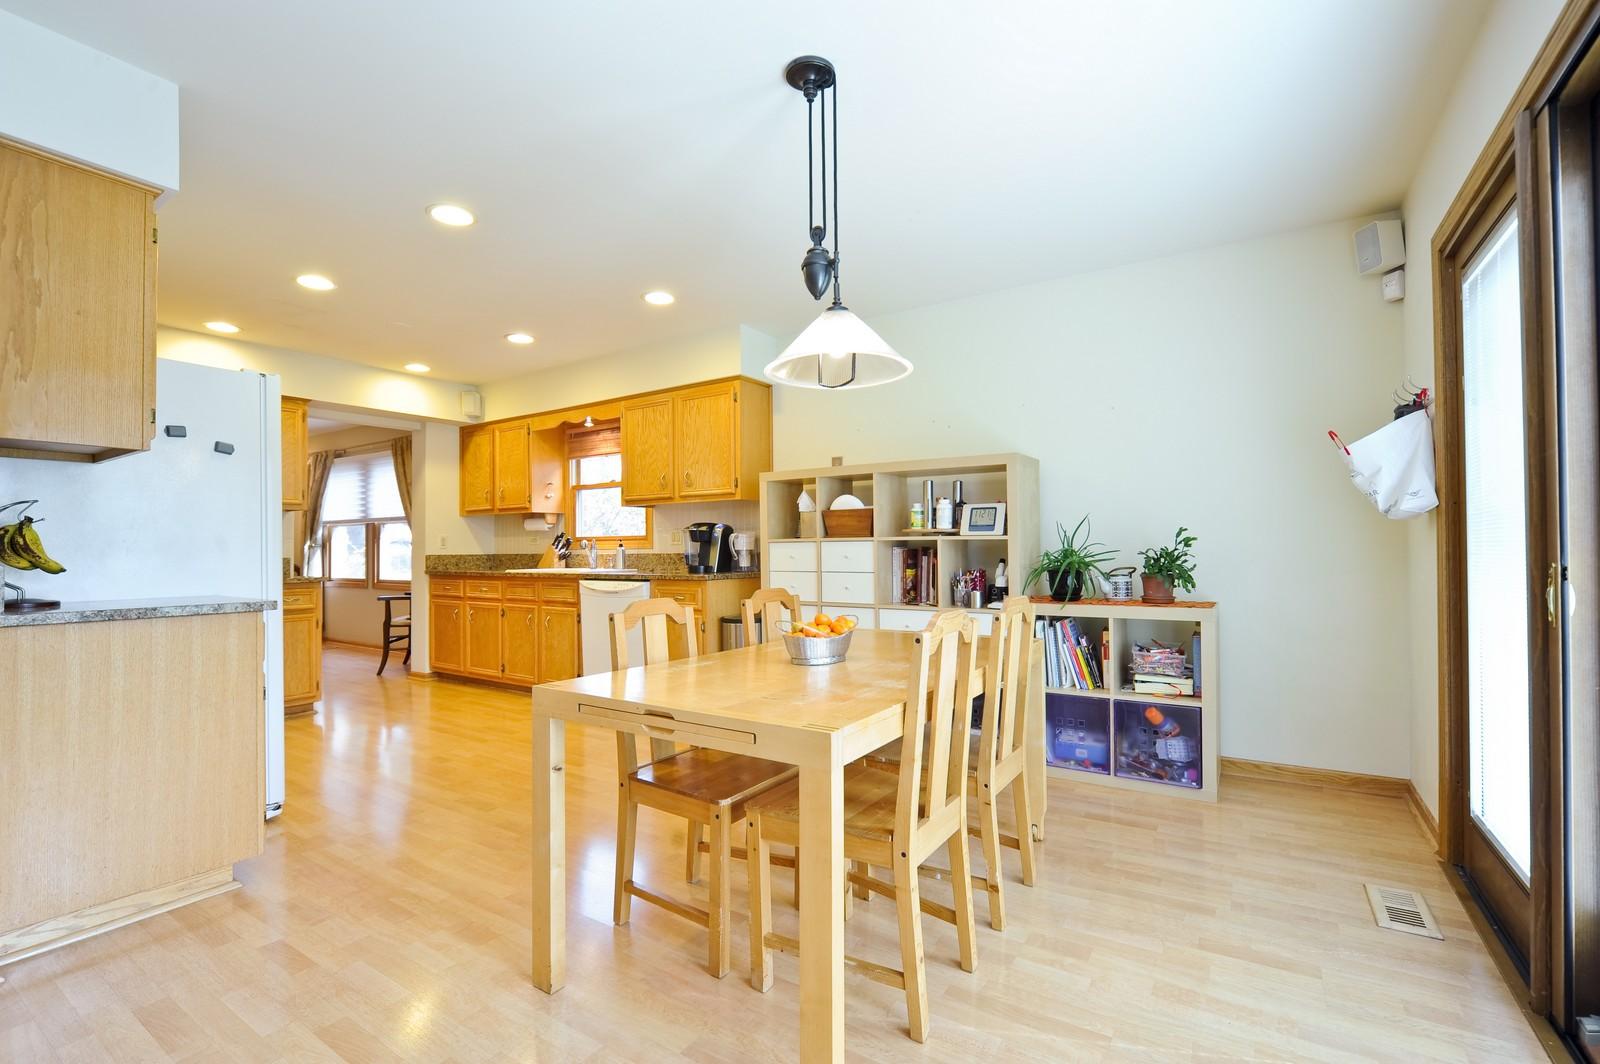 Real Estate Photography - 394 Jefferson, Glencoe, IL, 60022 - Kitchen / Breakfast Room